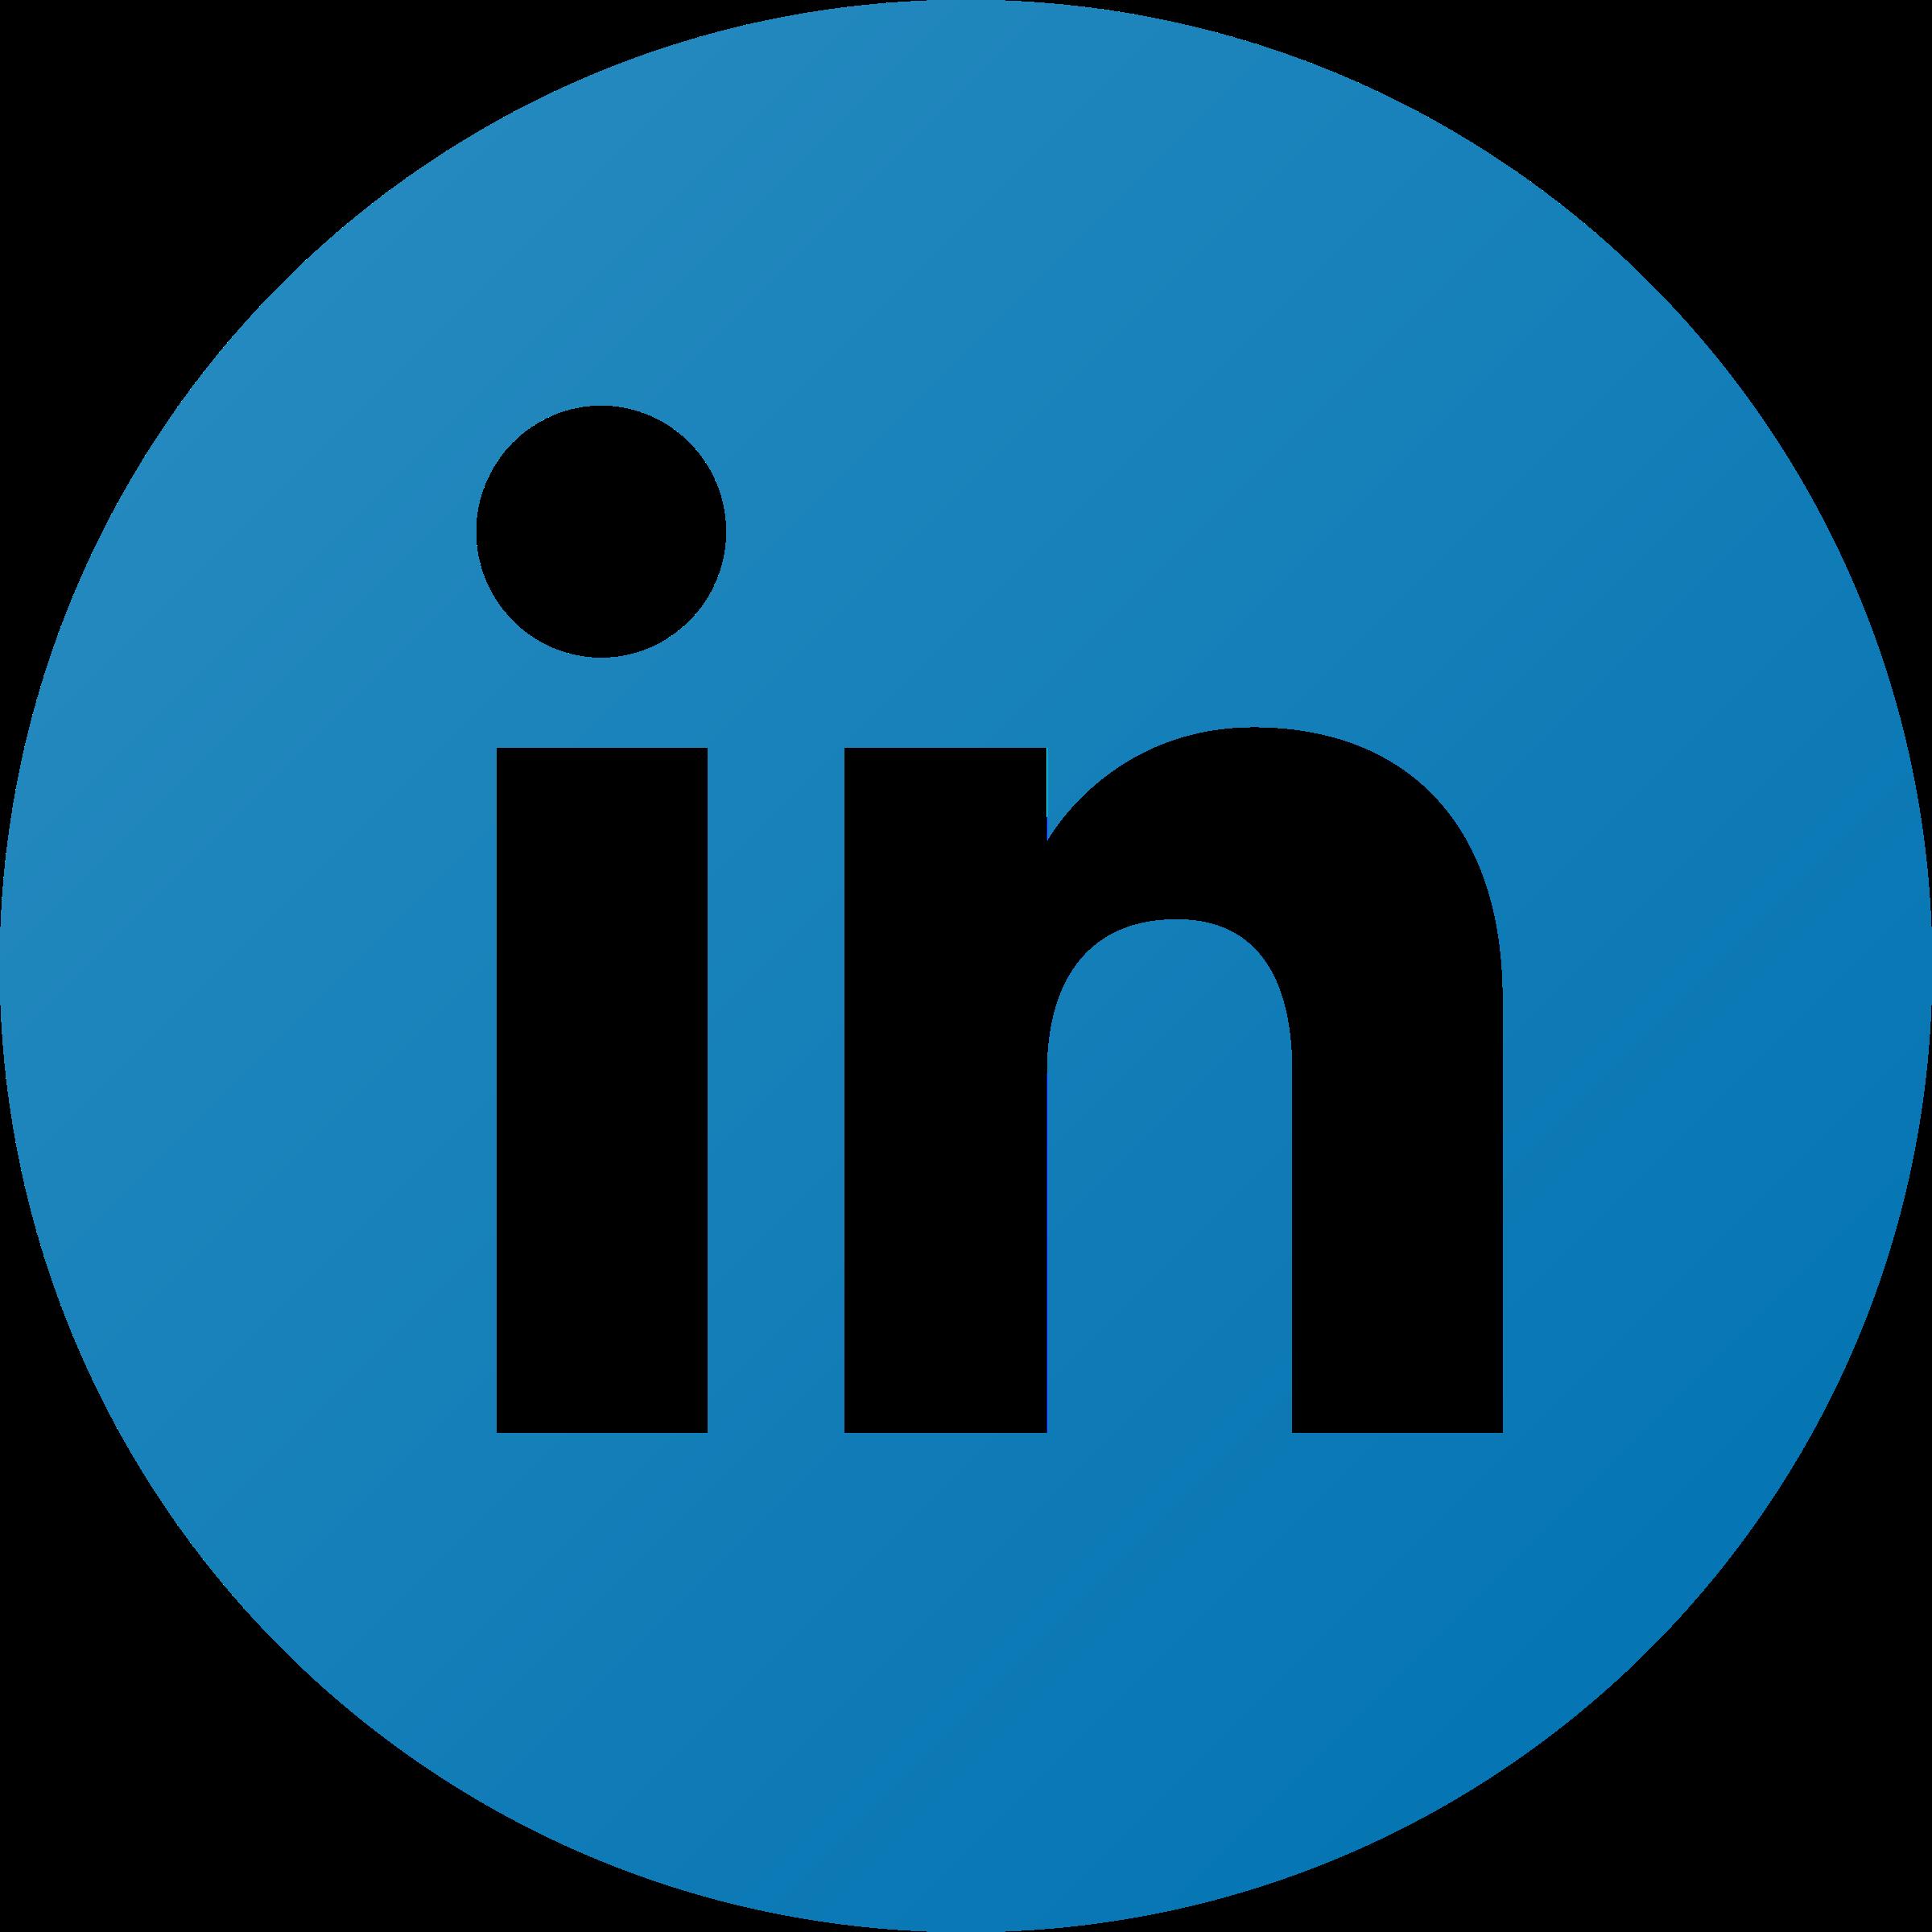 Hasil gambar untuk logo linkedin